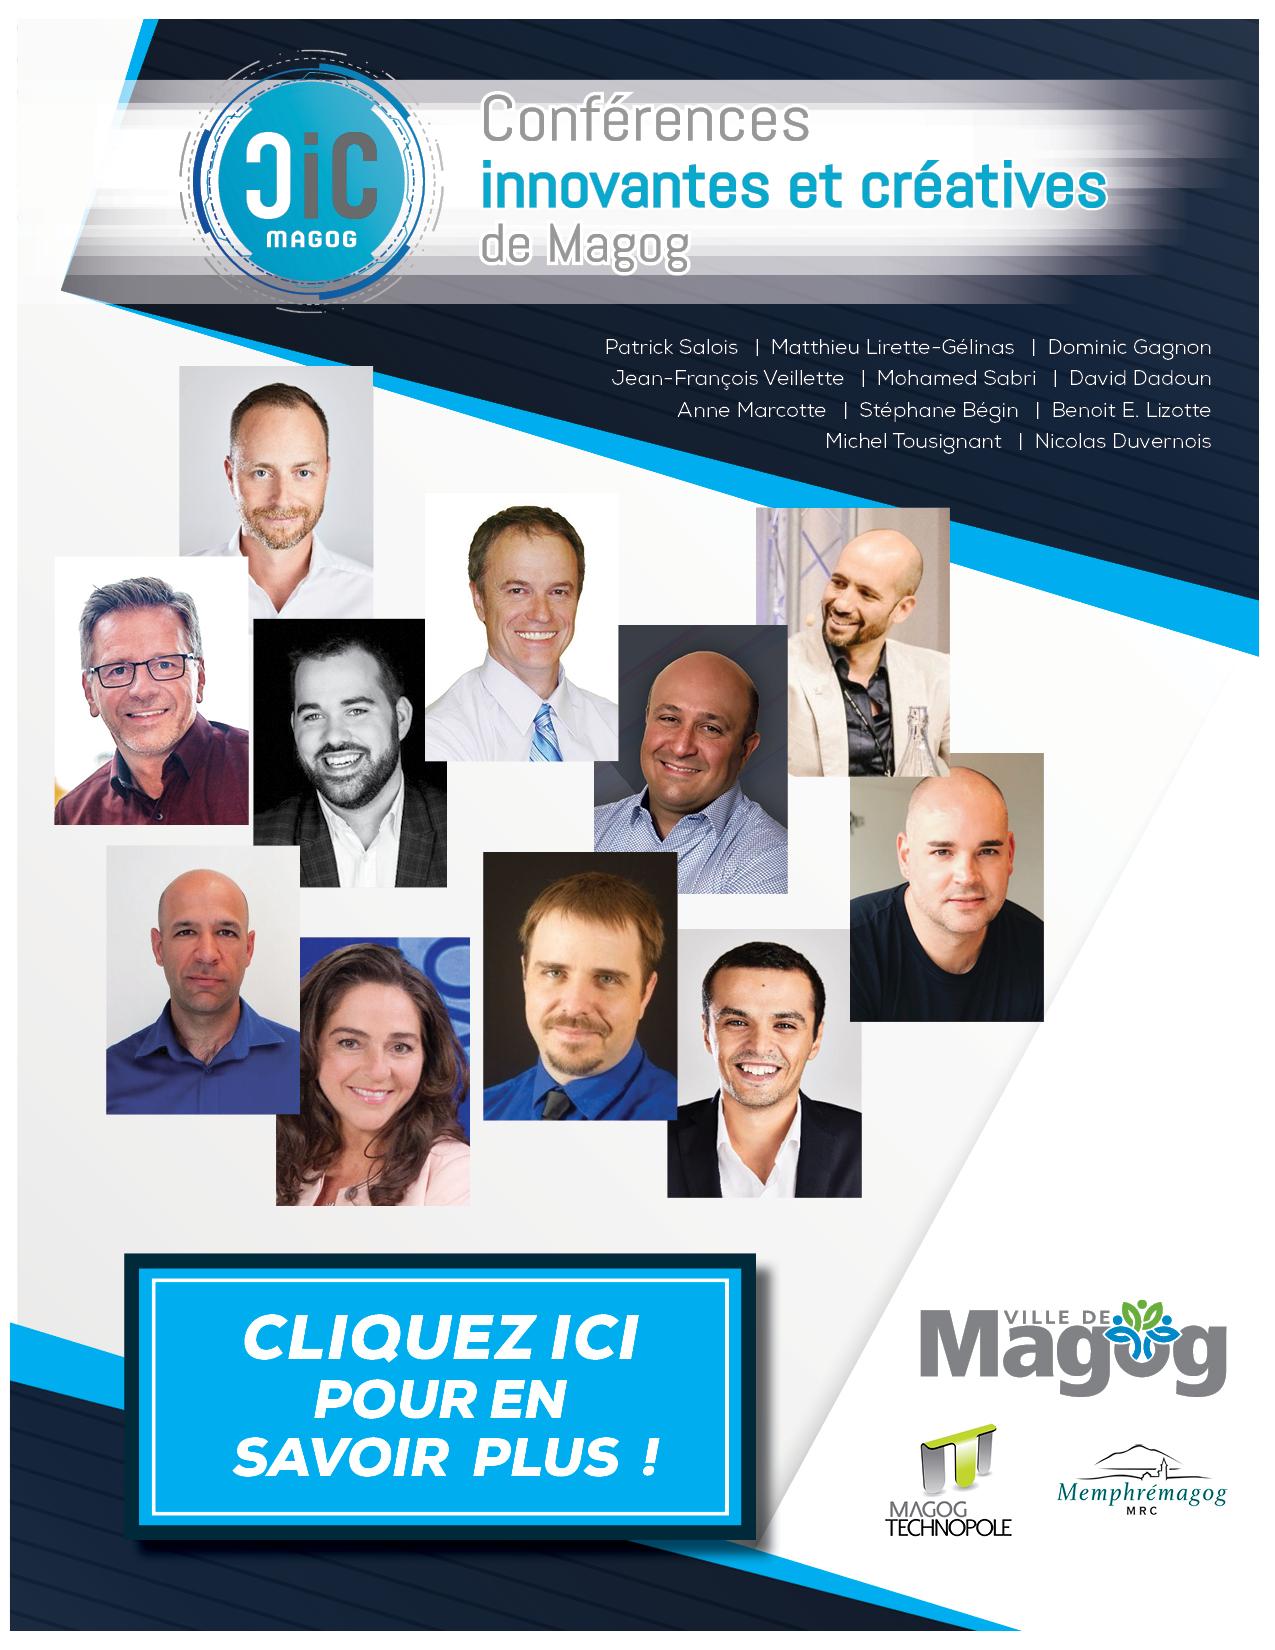 Conférences innovantes et créatives de Magog 2018-2019